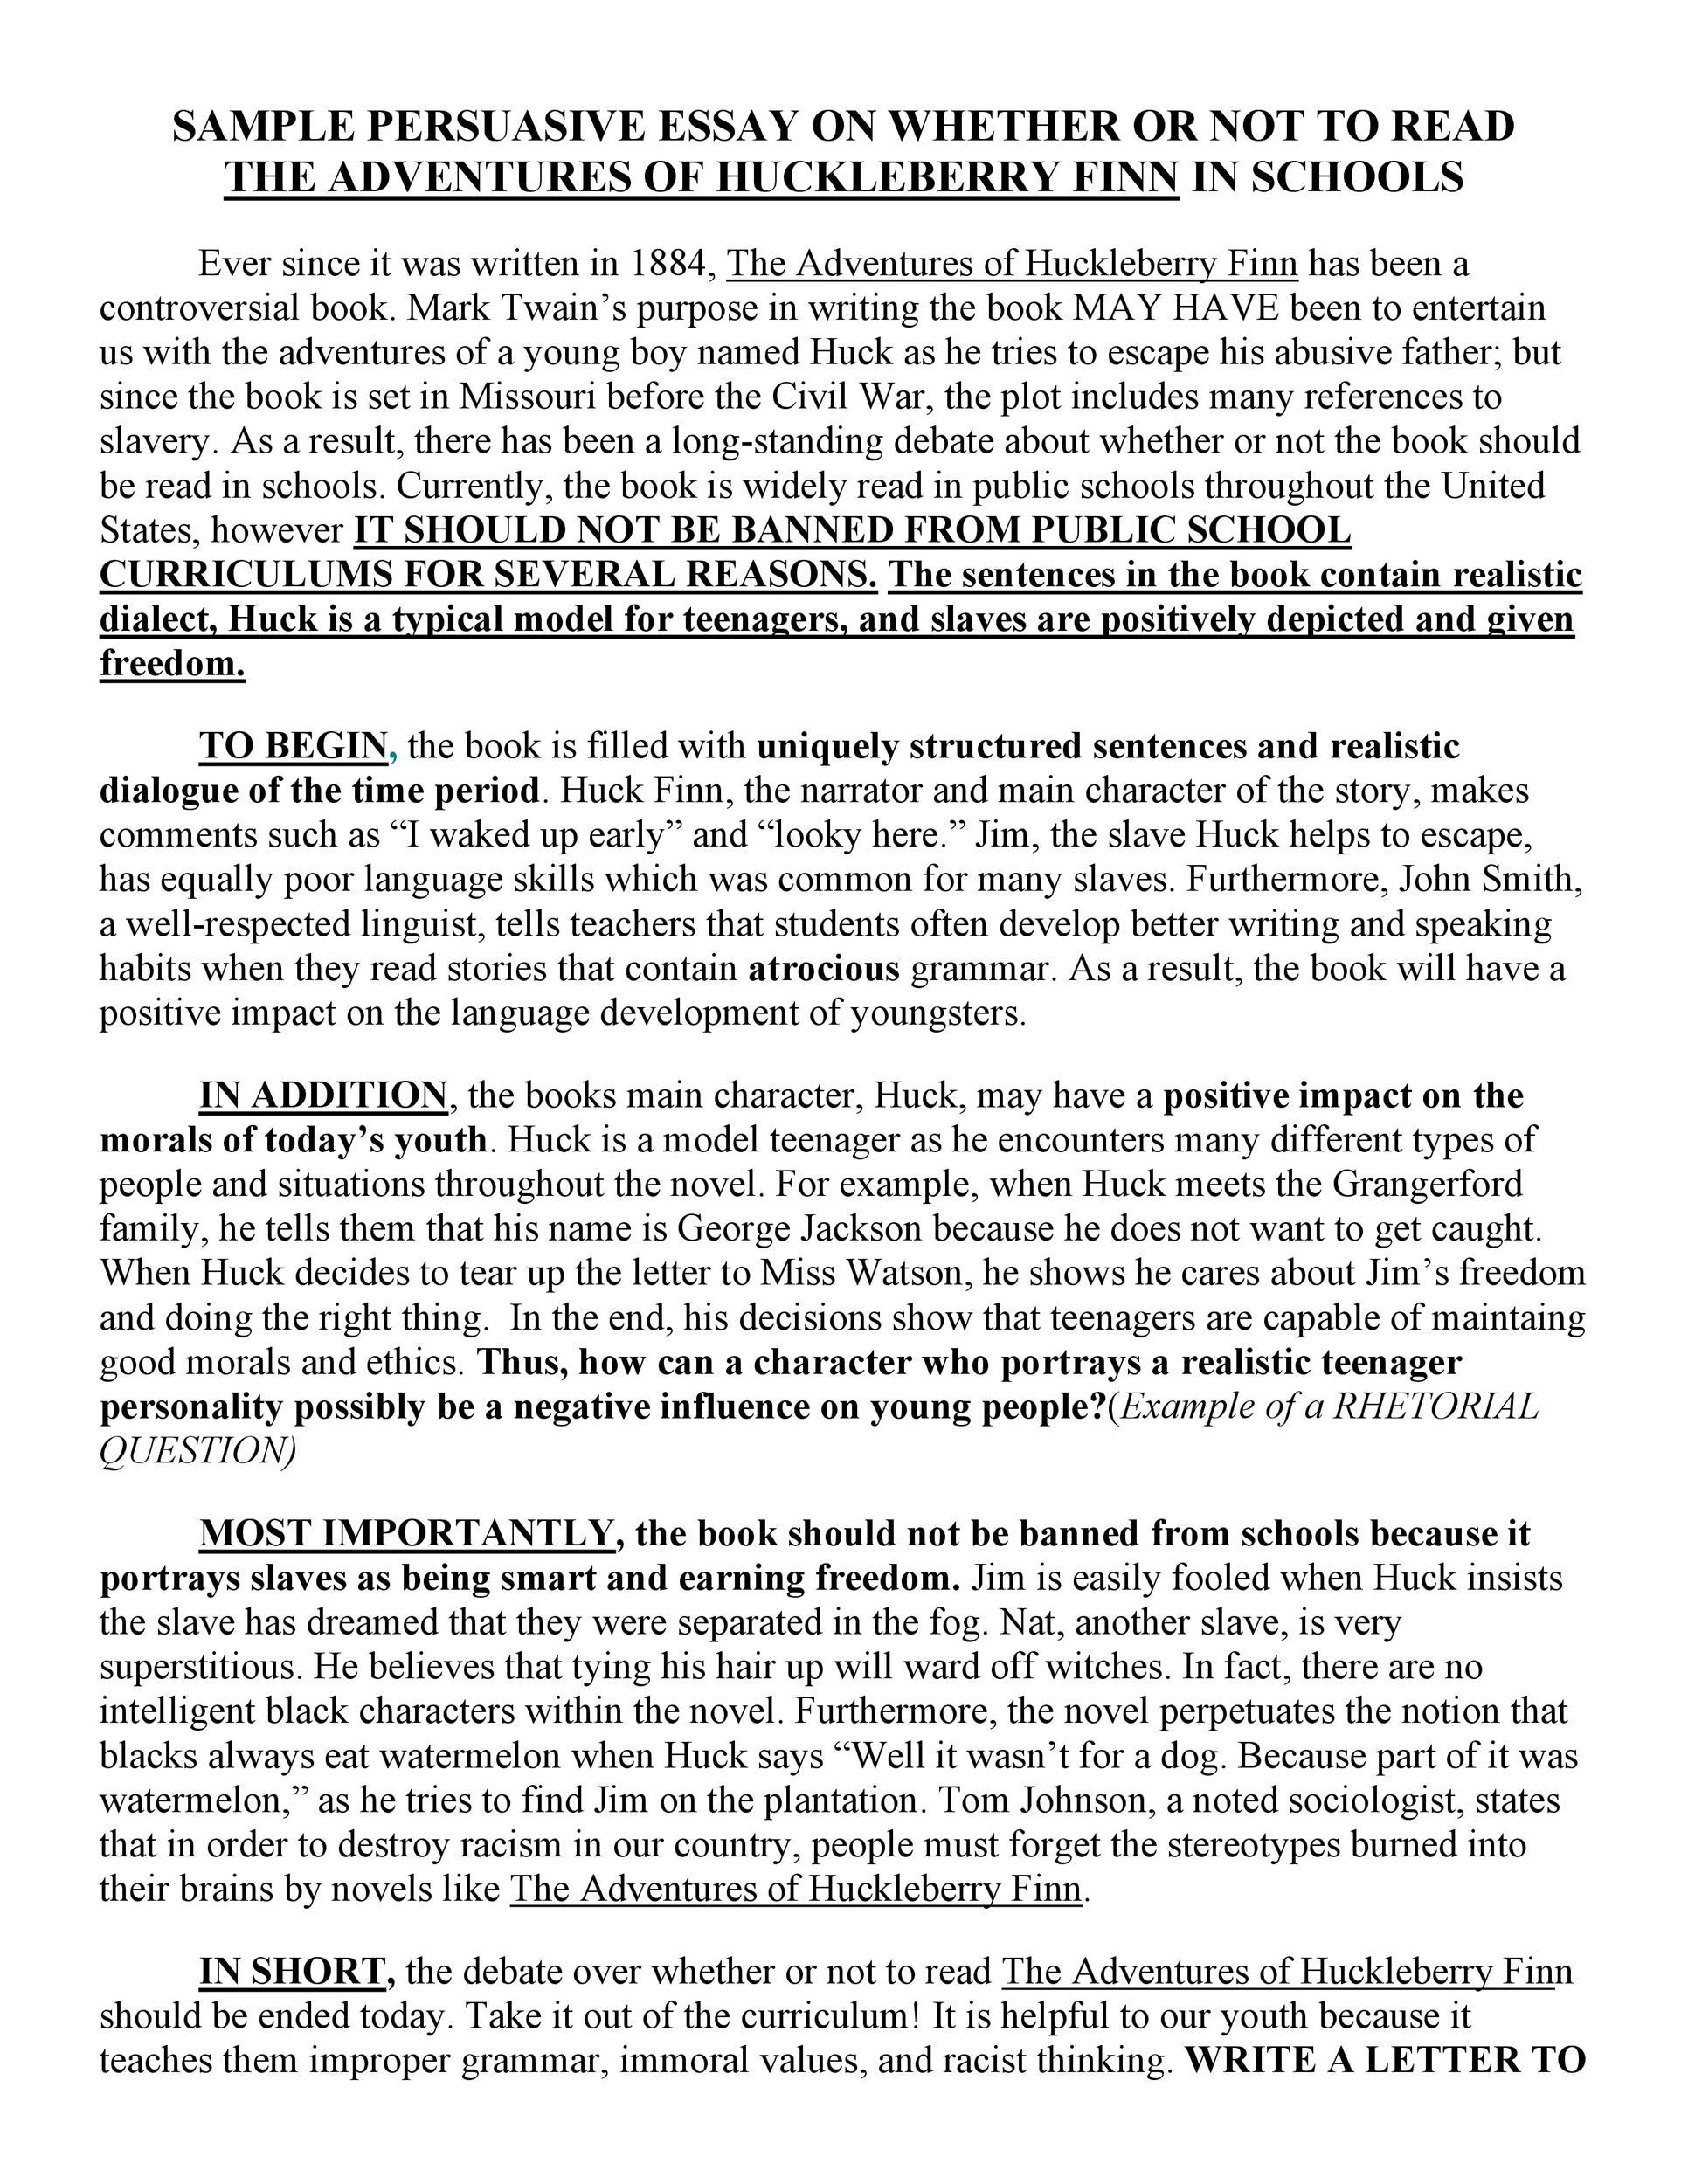 Free persuasive essay example 21